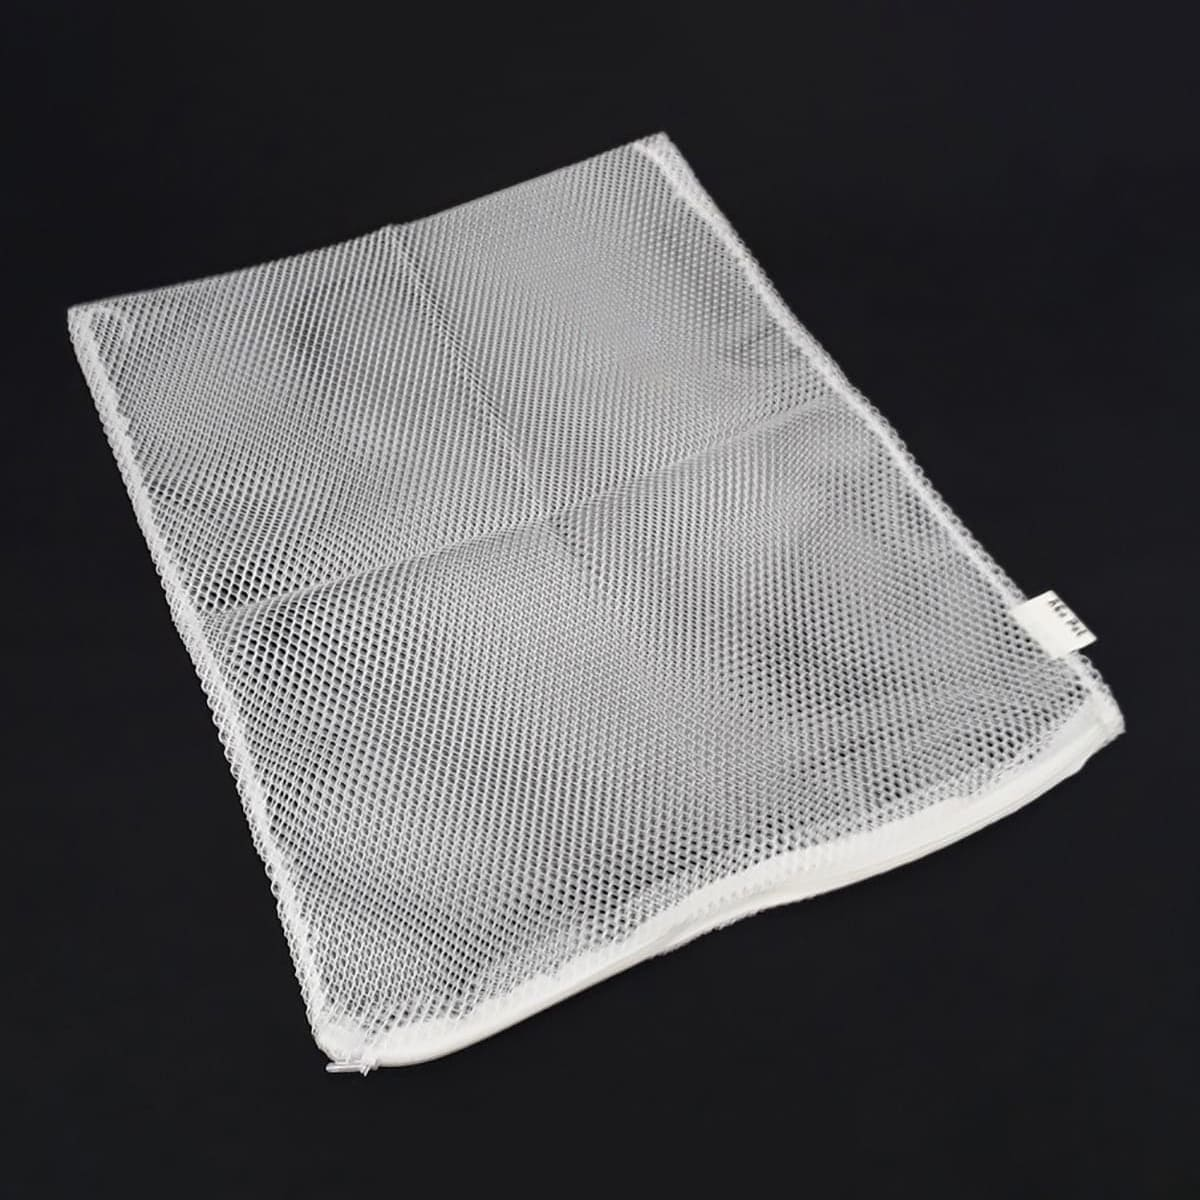 Bolsa para Material Filtrante N°4 WFish - 25X30 cm